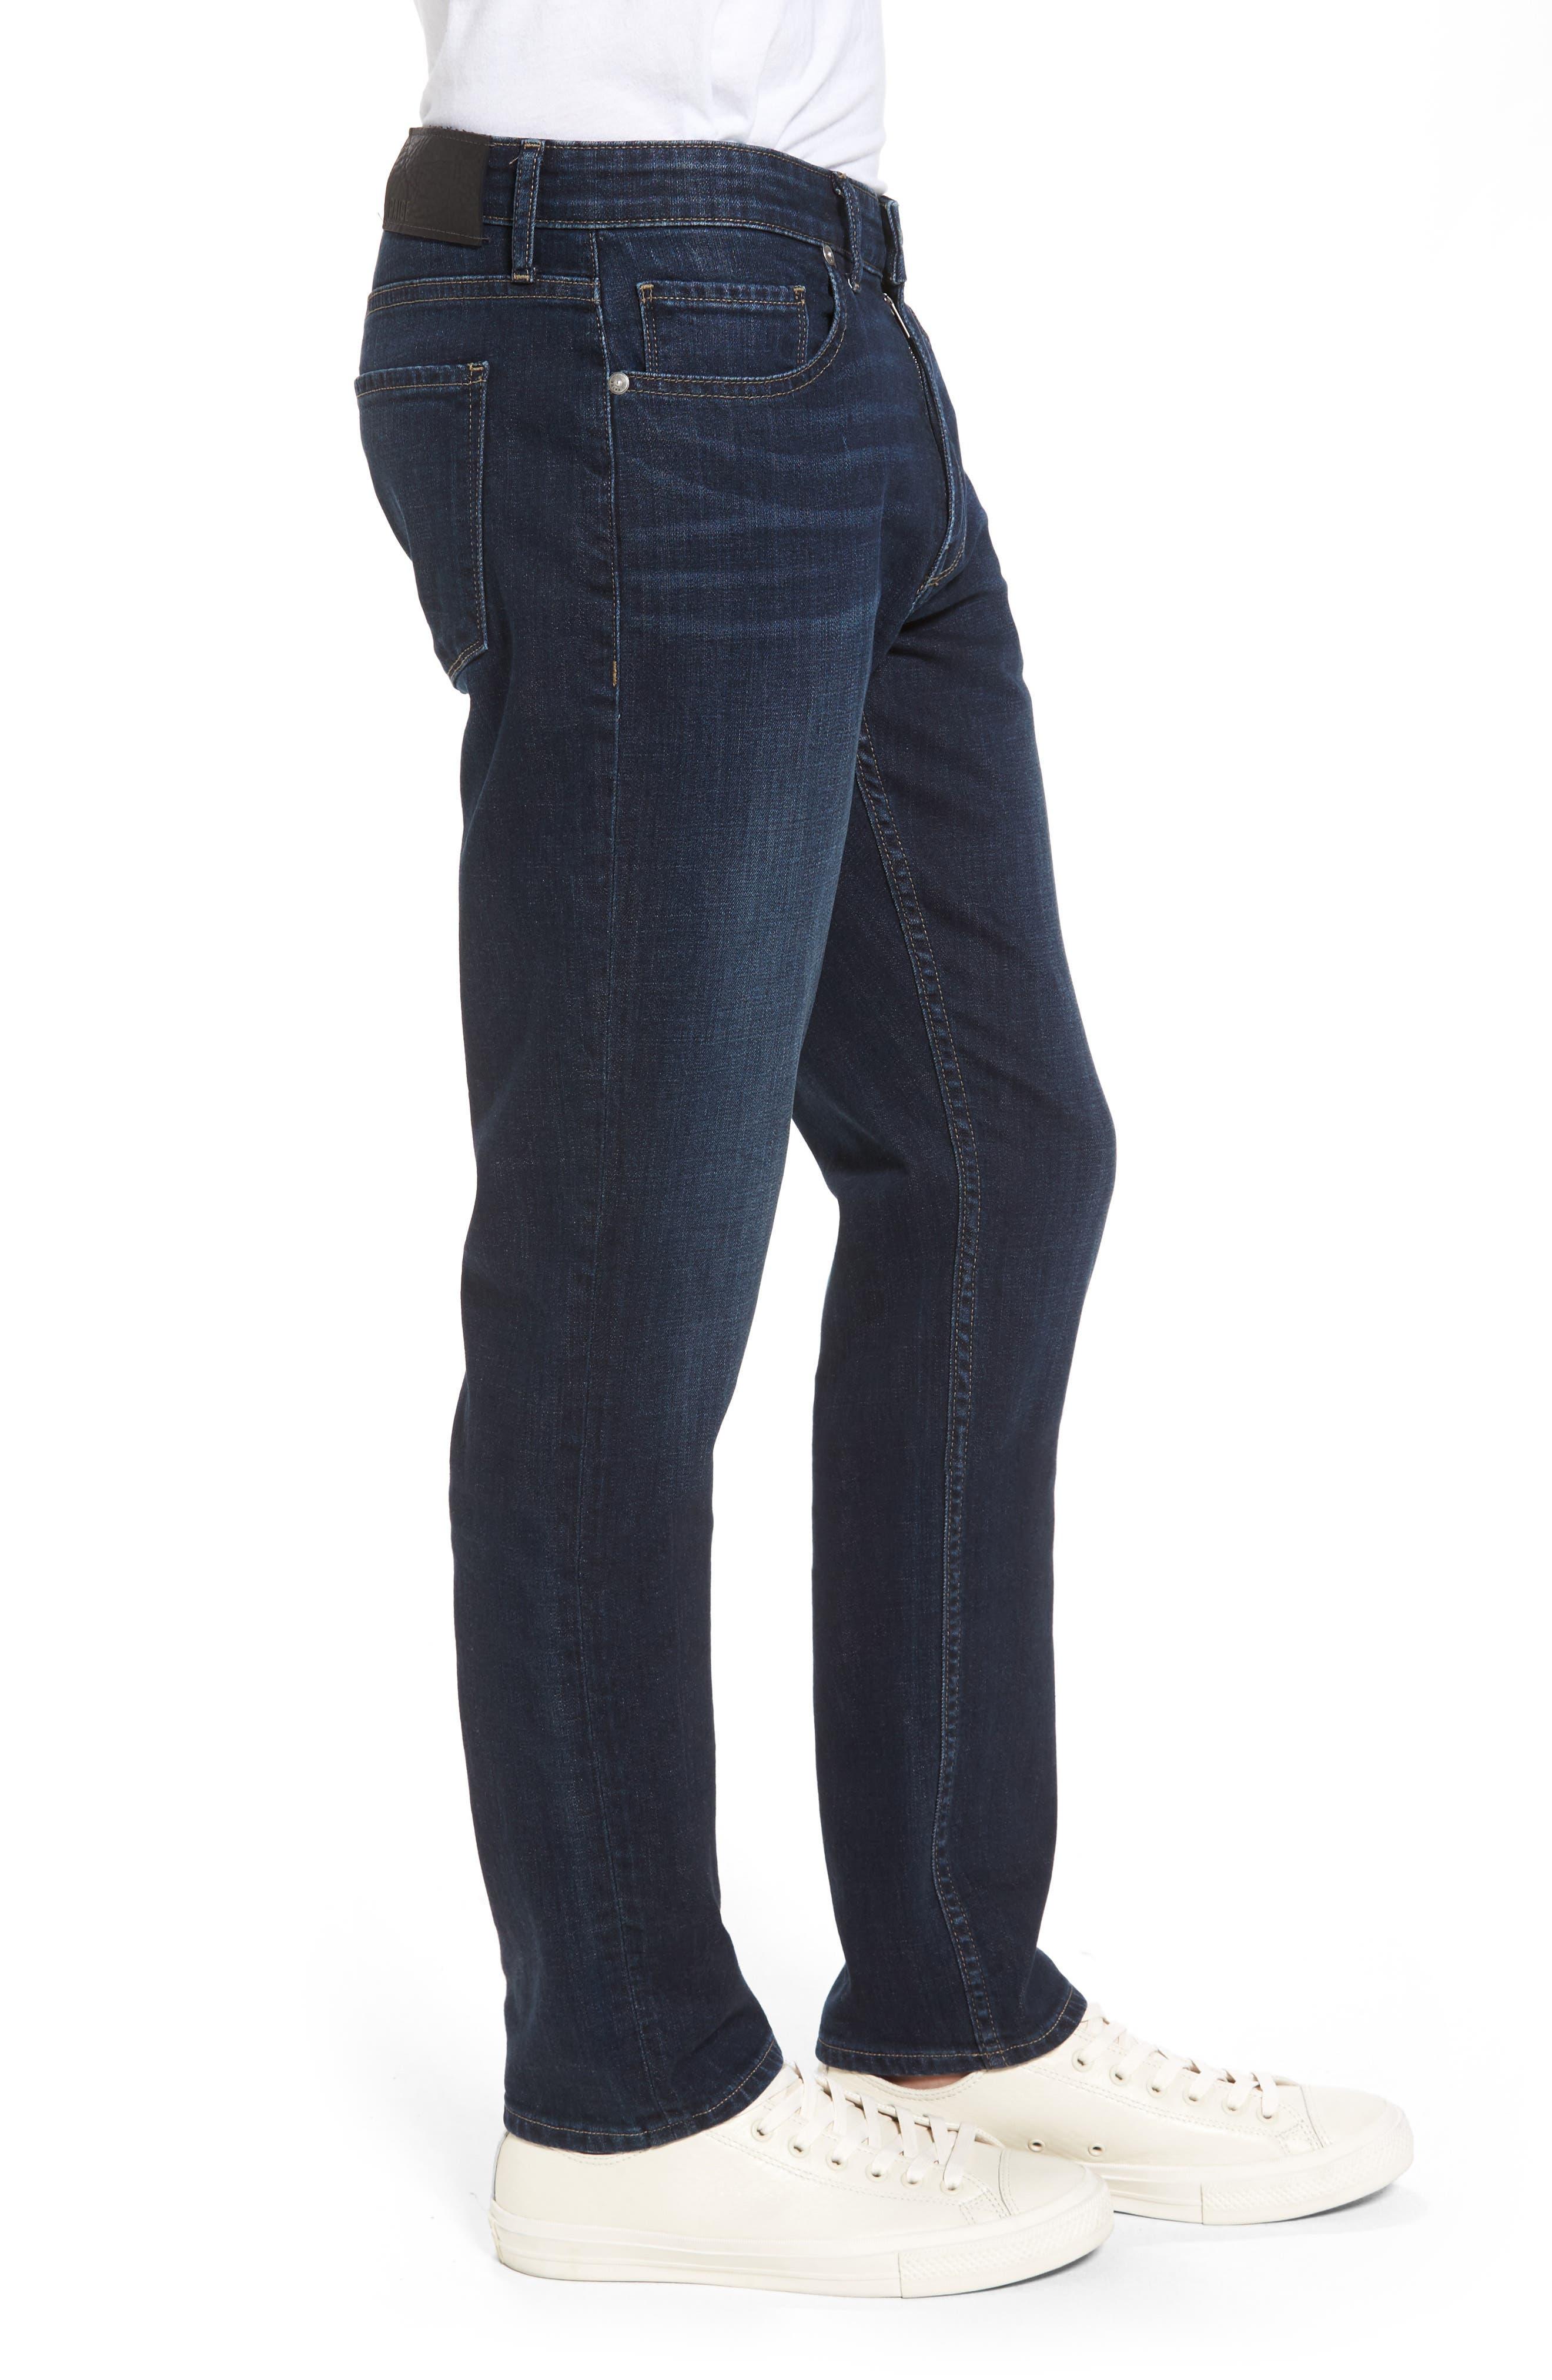 Lennox Slim Fit Jeans,                             Alternate thumbnail 3, color,                             400